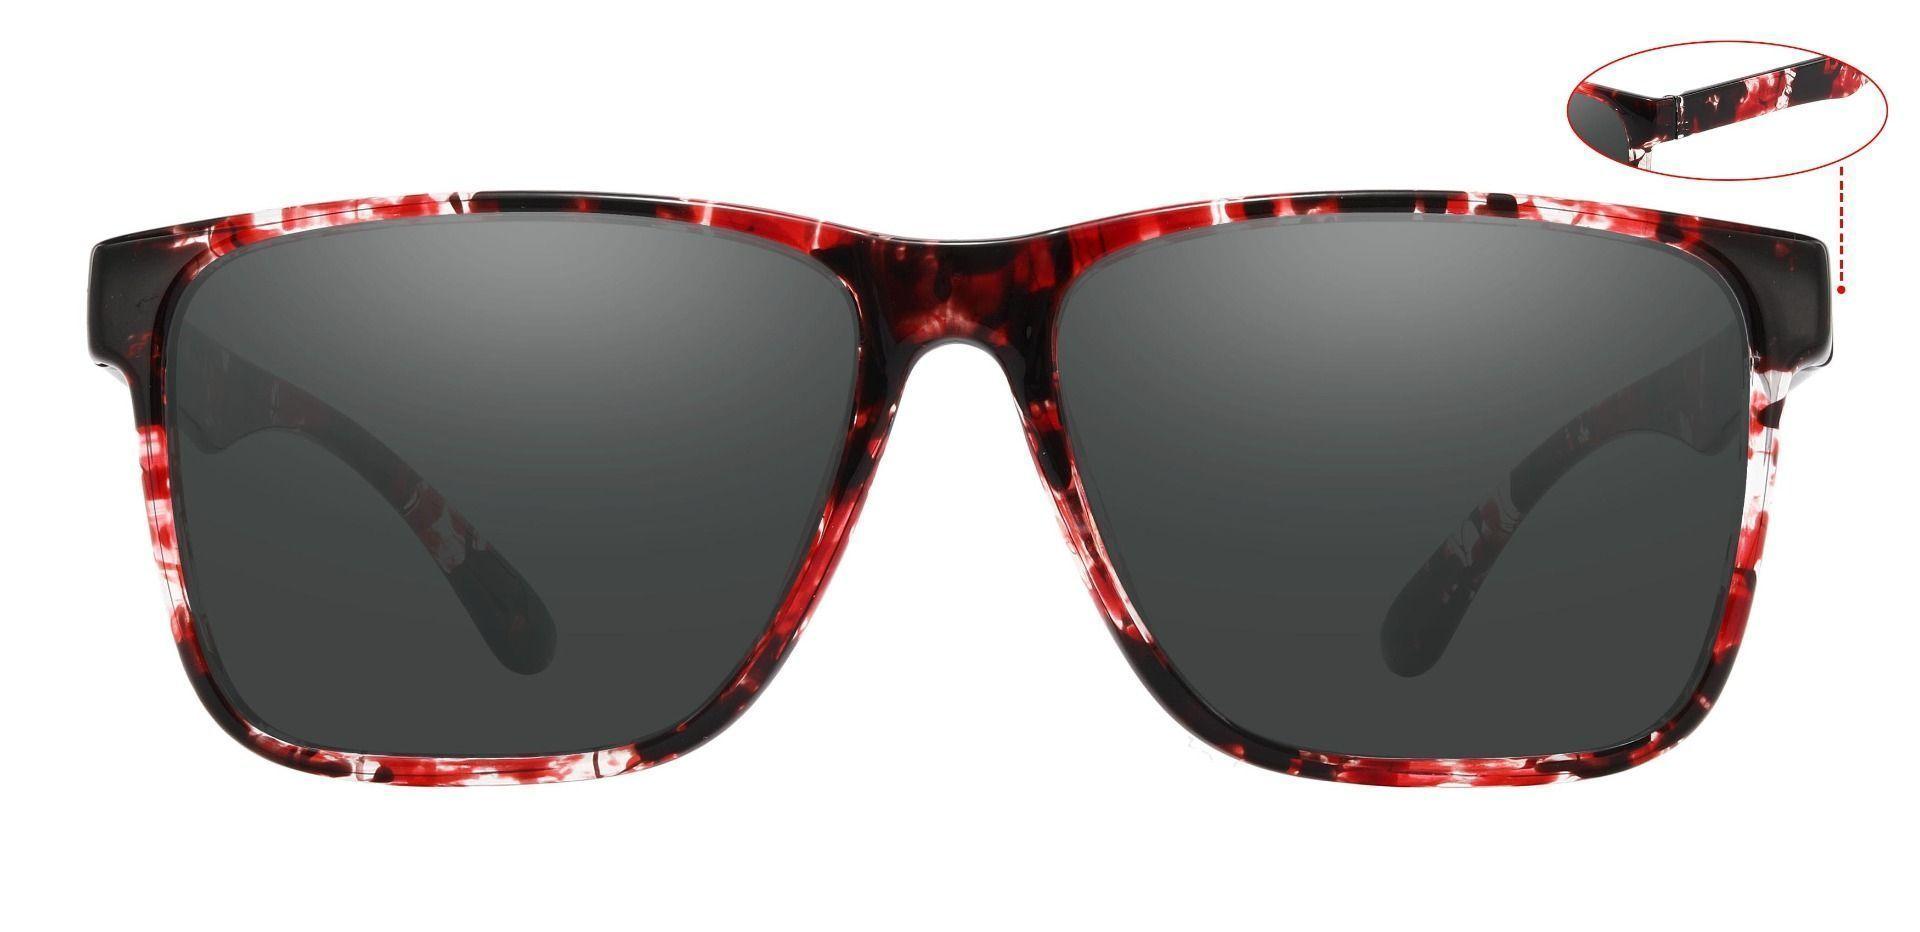 Barnum Square Prescription Sunglasses - Tortoise Frame With Gray Lenses